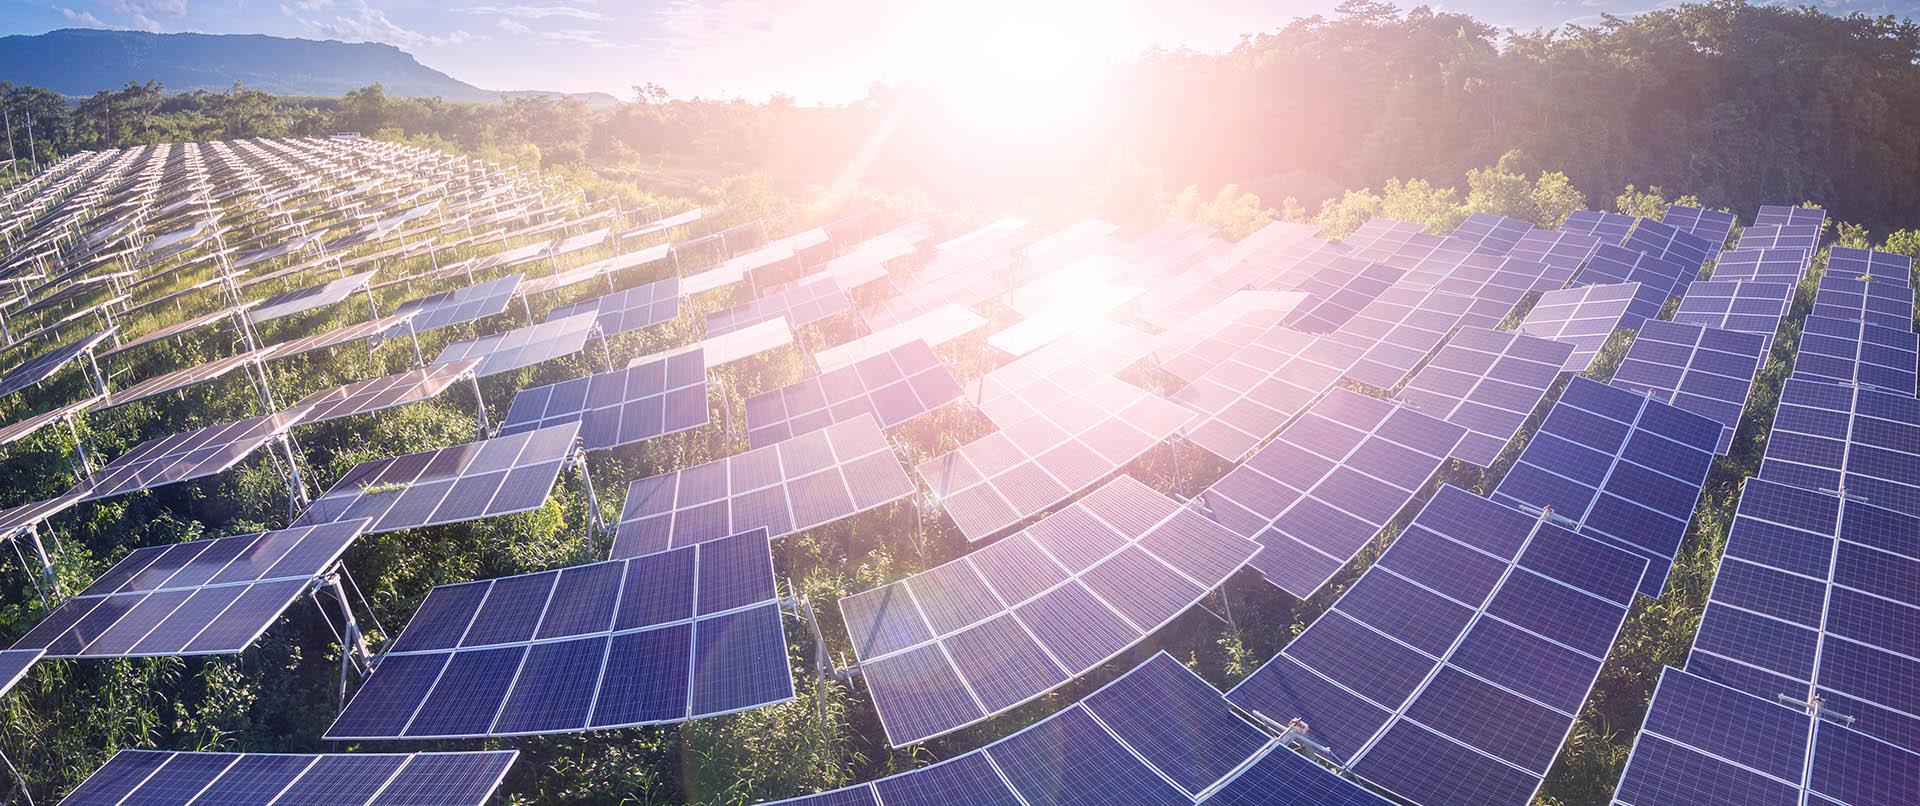 Solar Energy in Spain S.L.